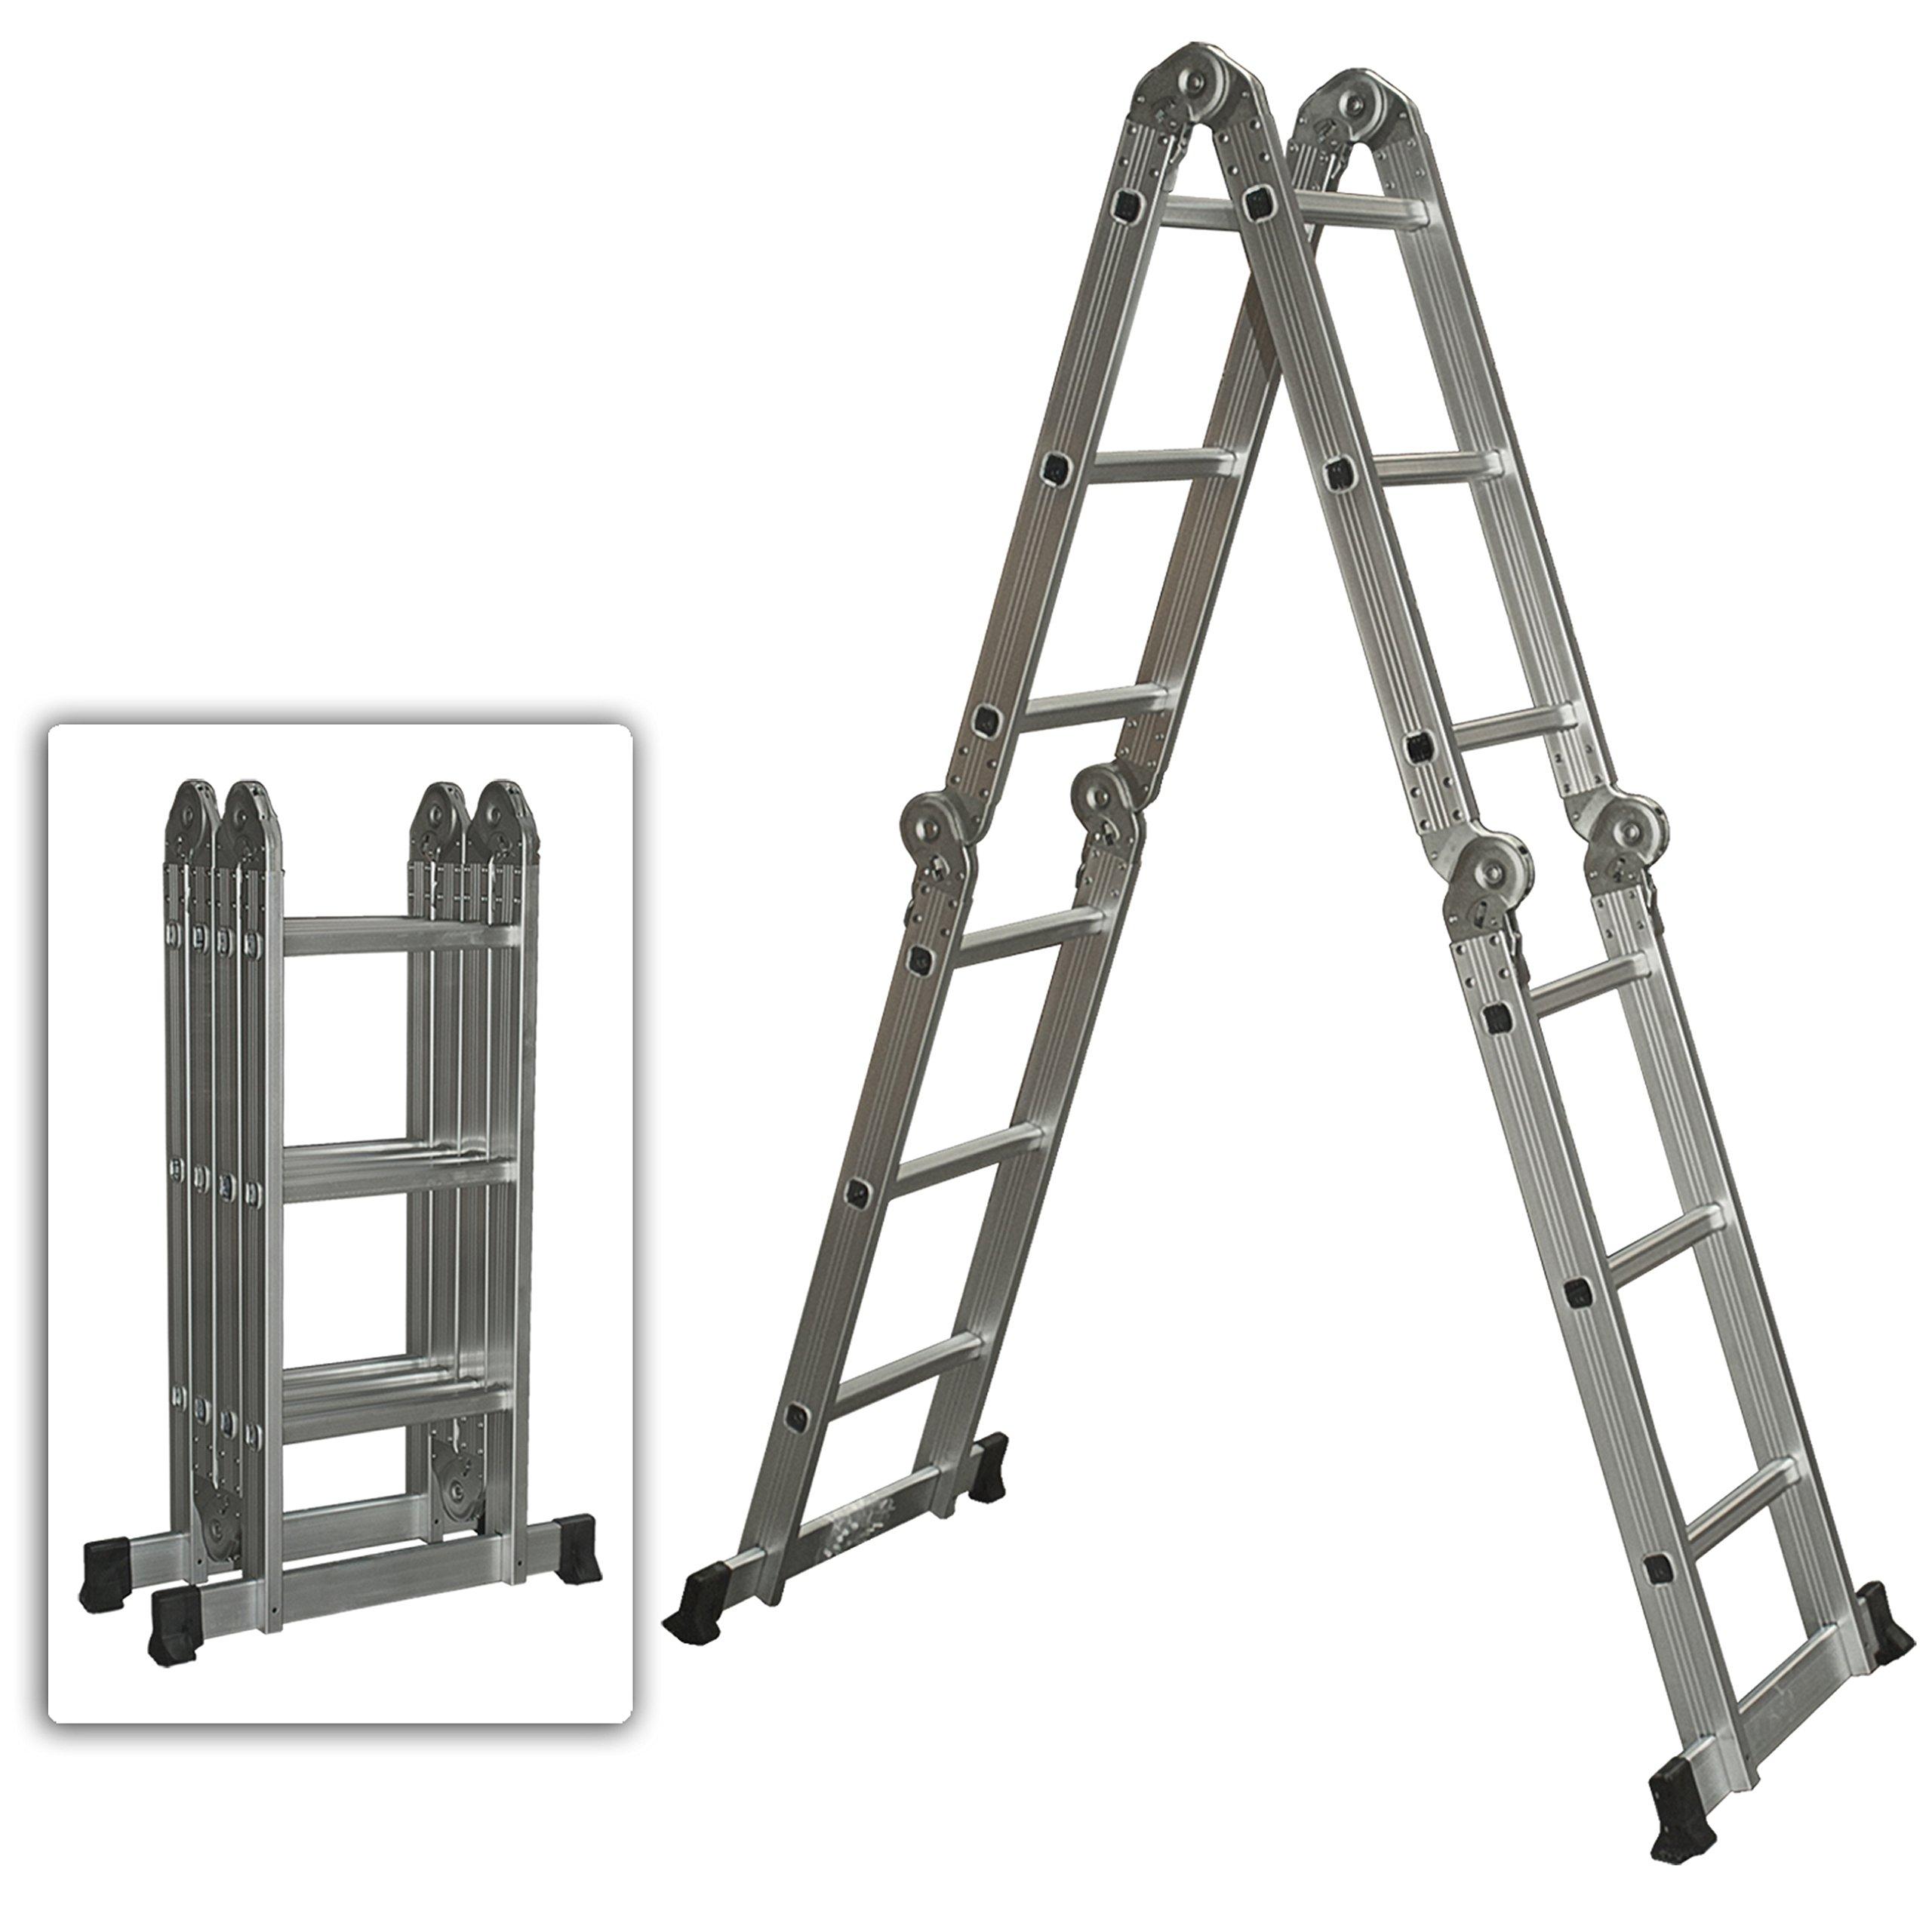 Extensión escaleras 11 pies plegable de aluminio Paso sistema portátil poco gigante escalera telescópica multiusos: Amazon.es: Hogar